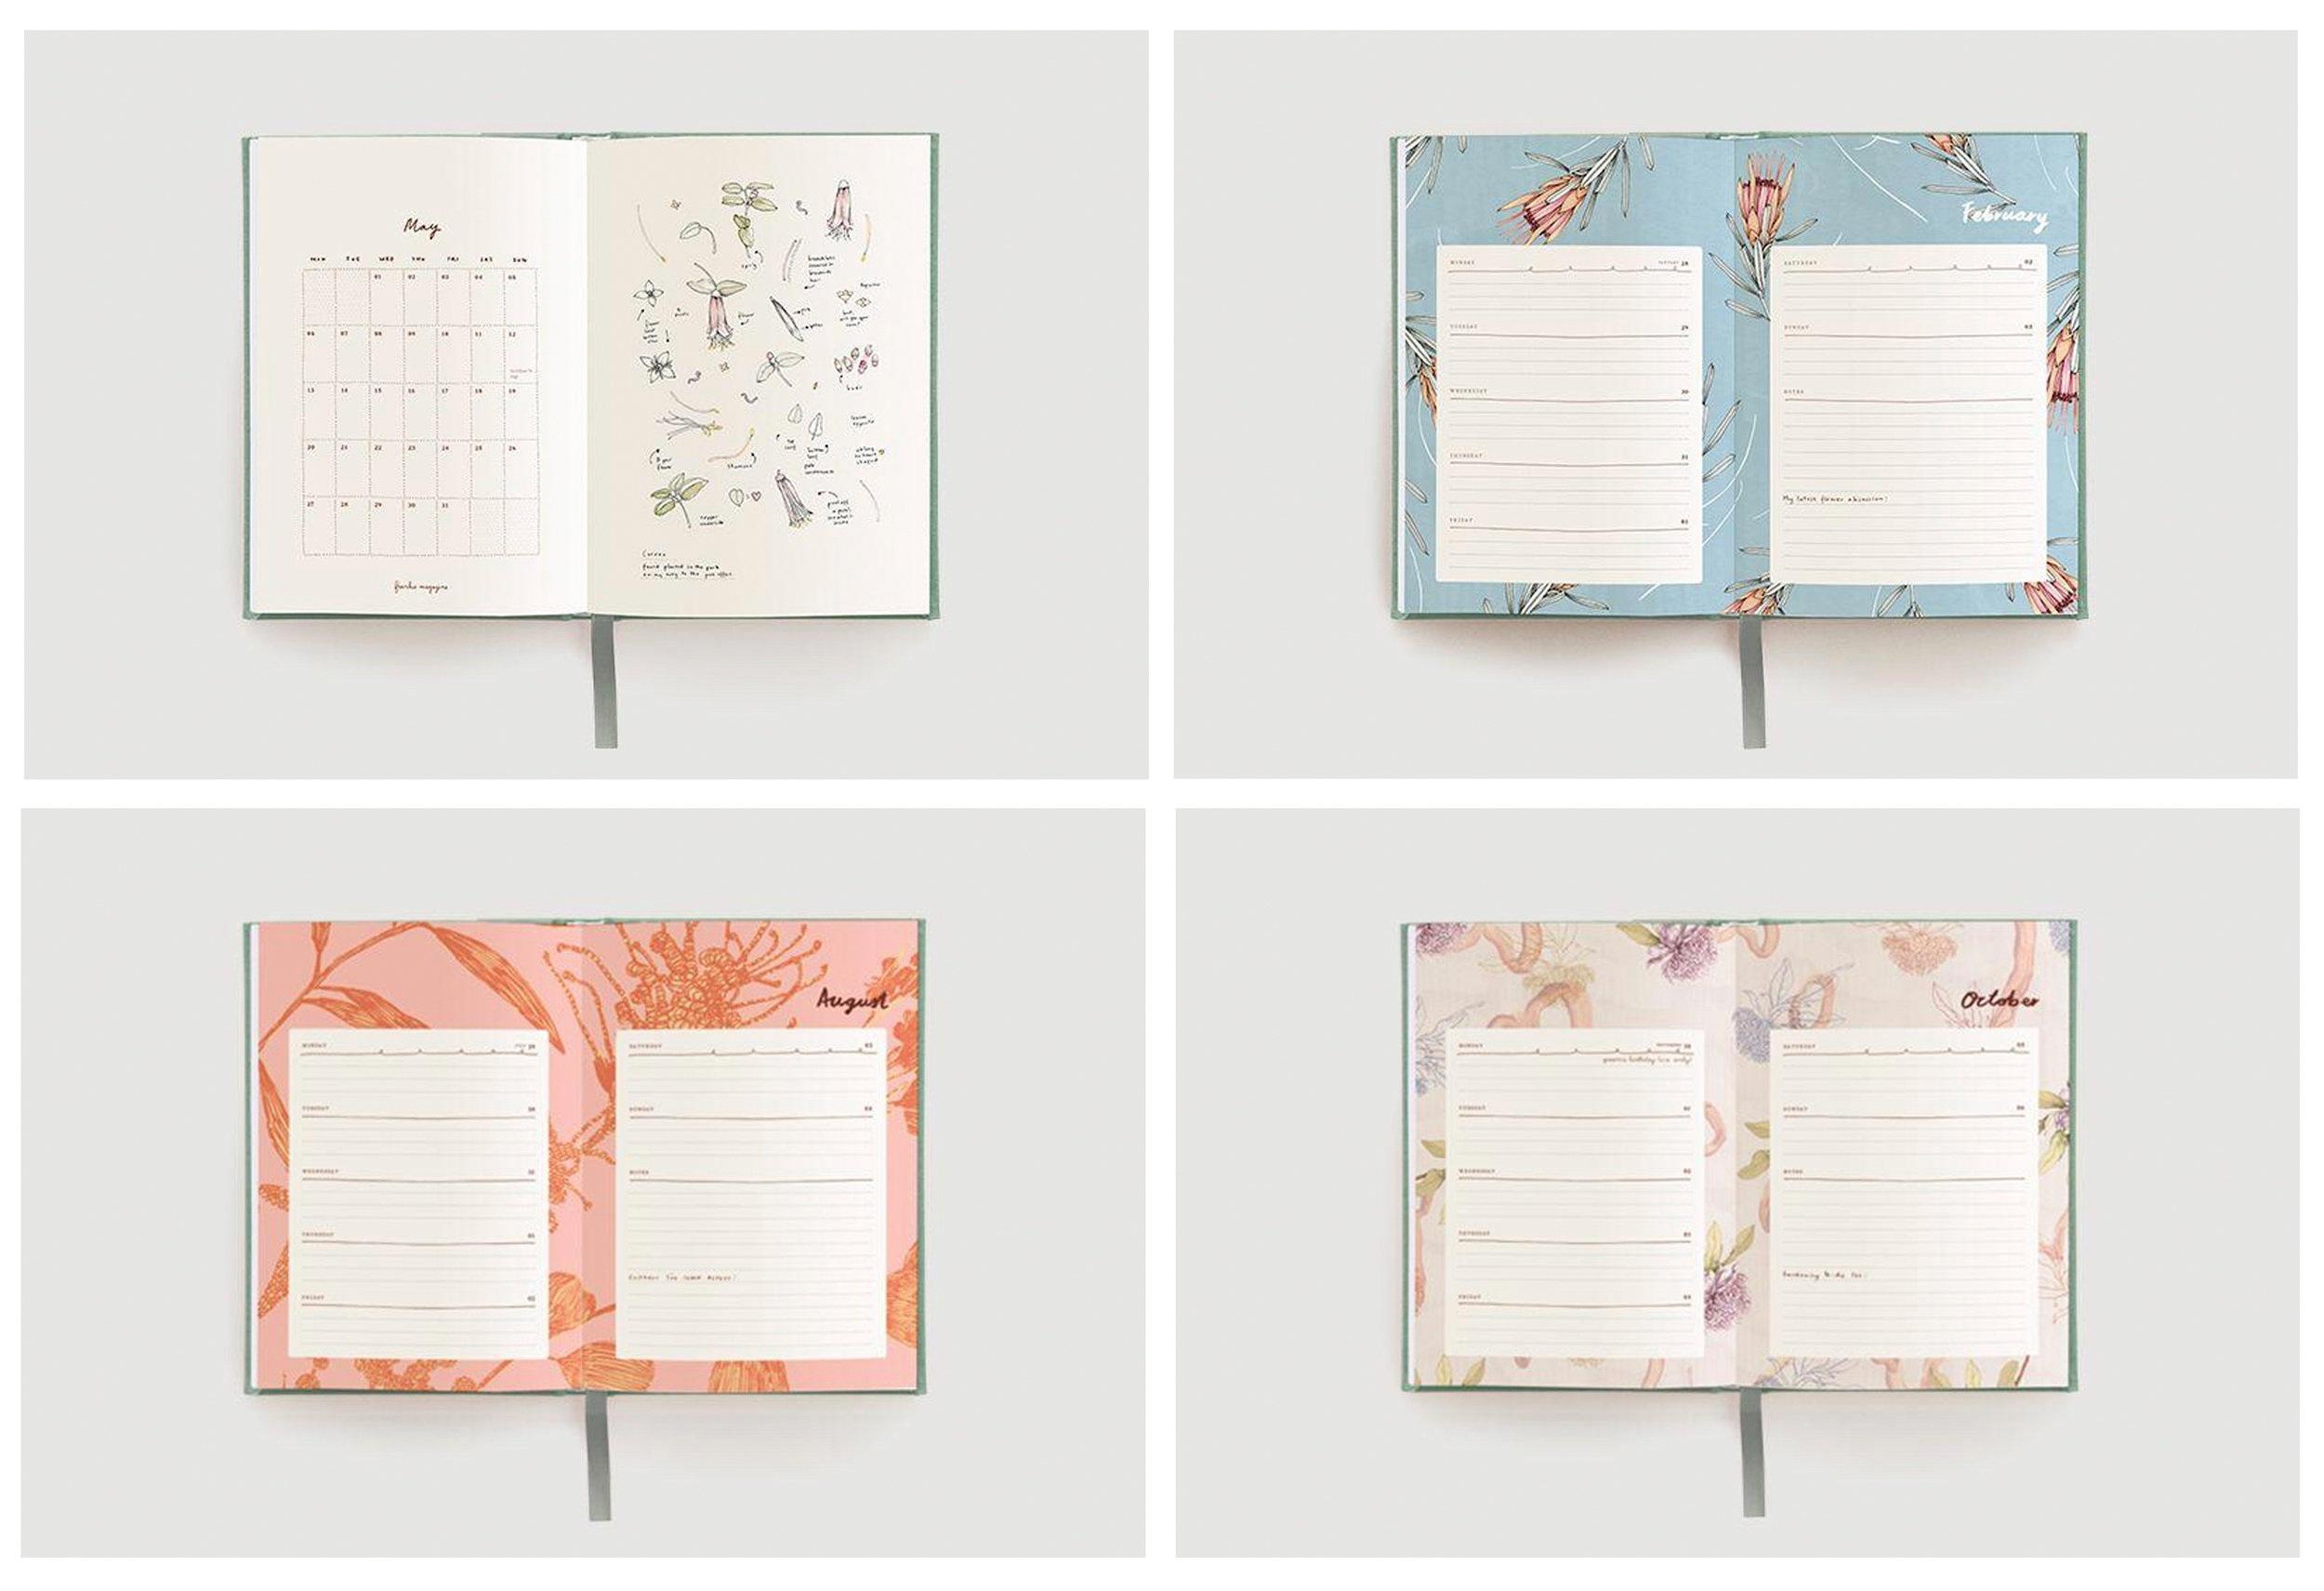 frankie diary 0.jpg